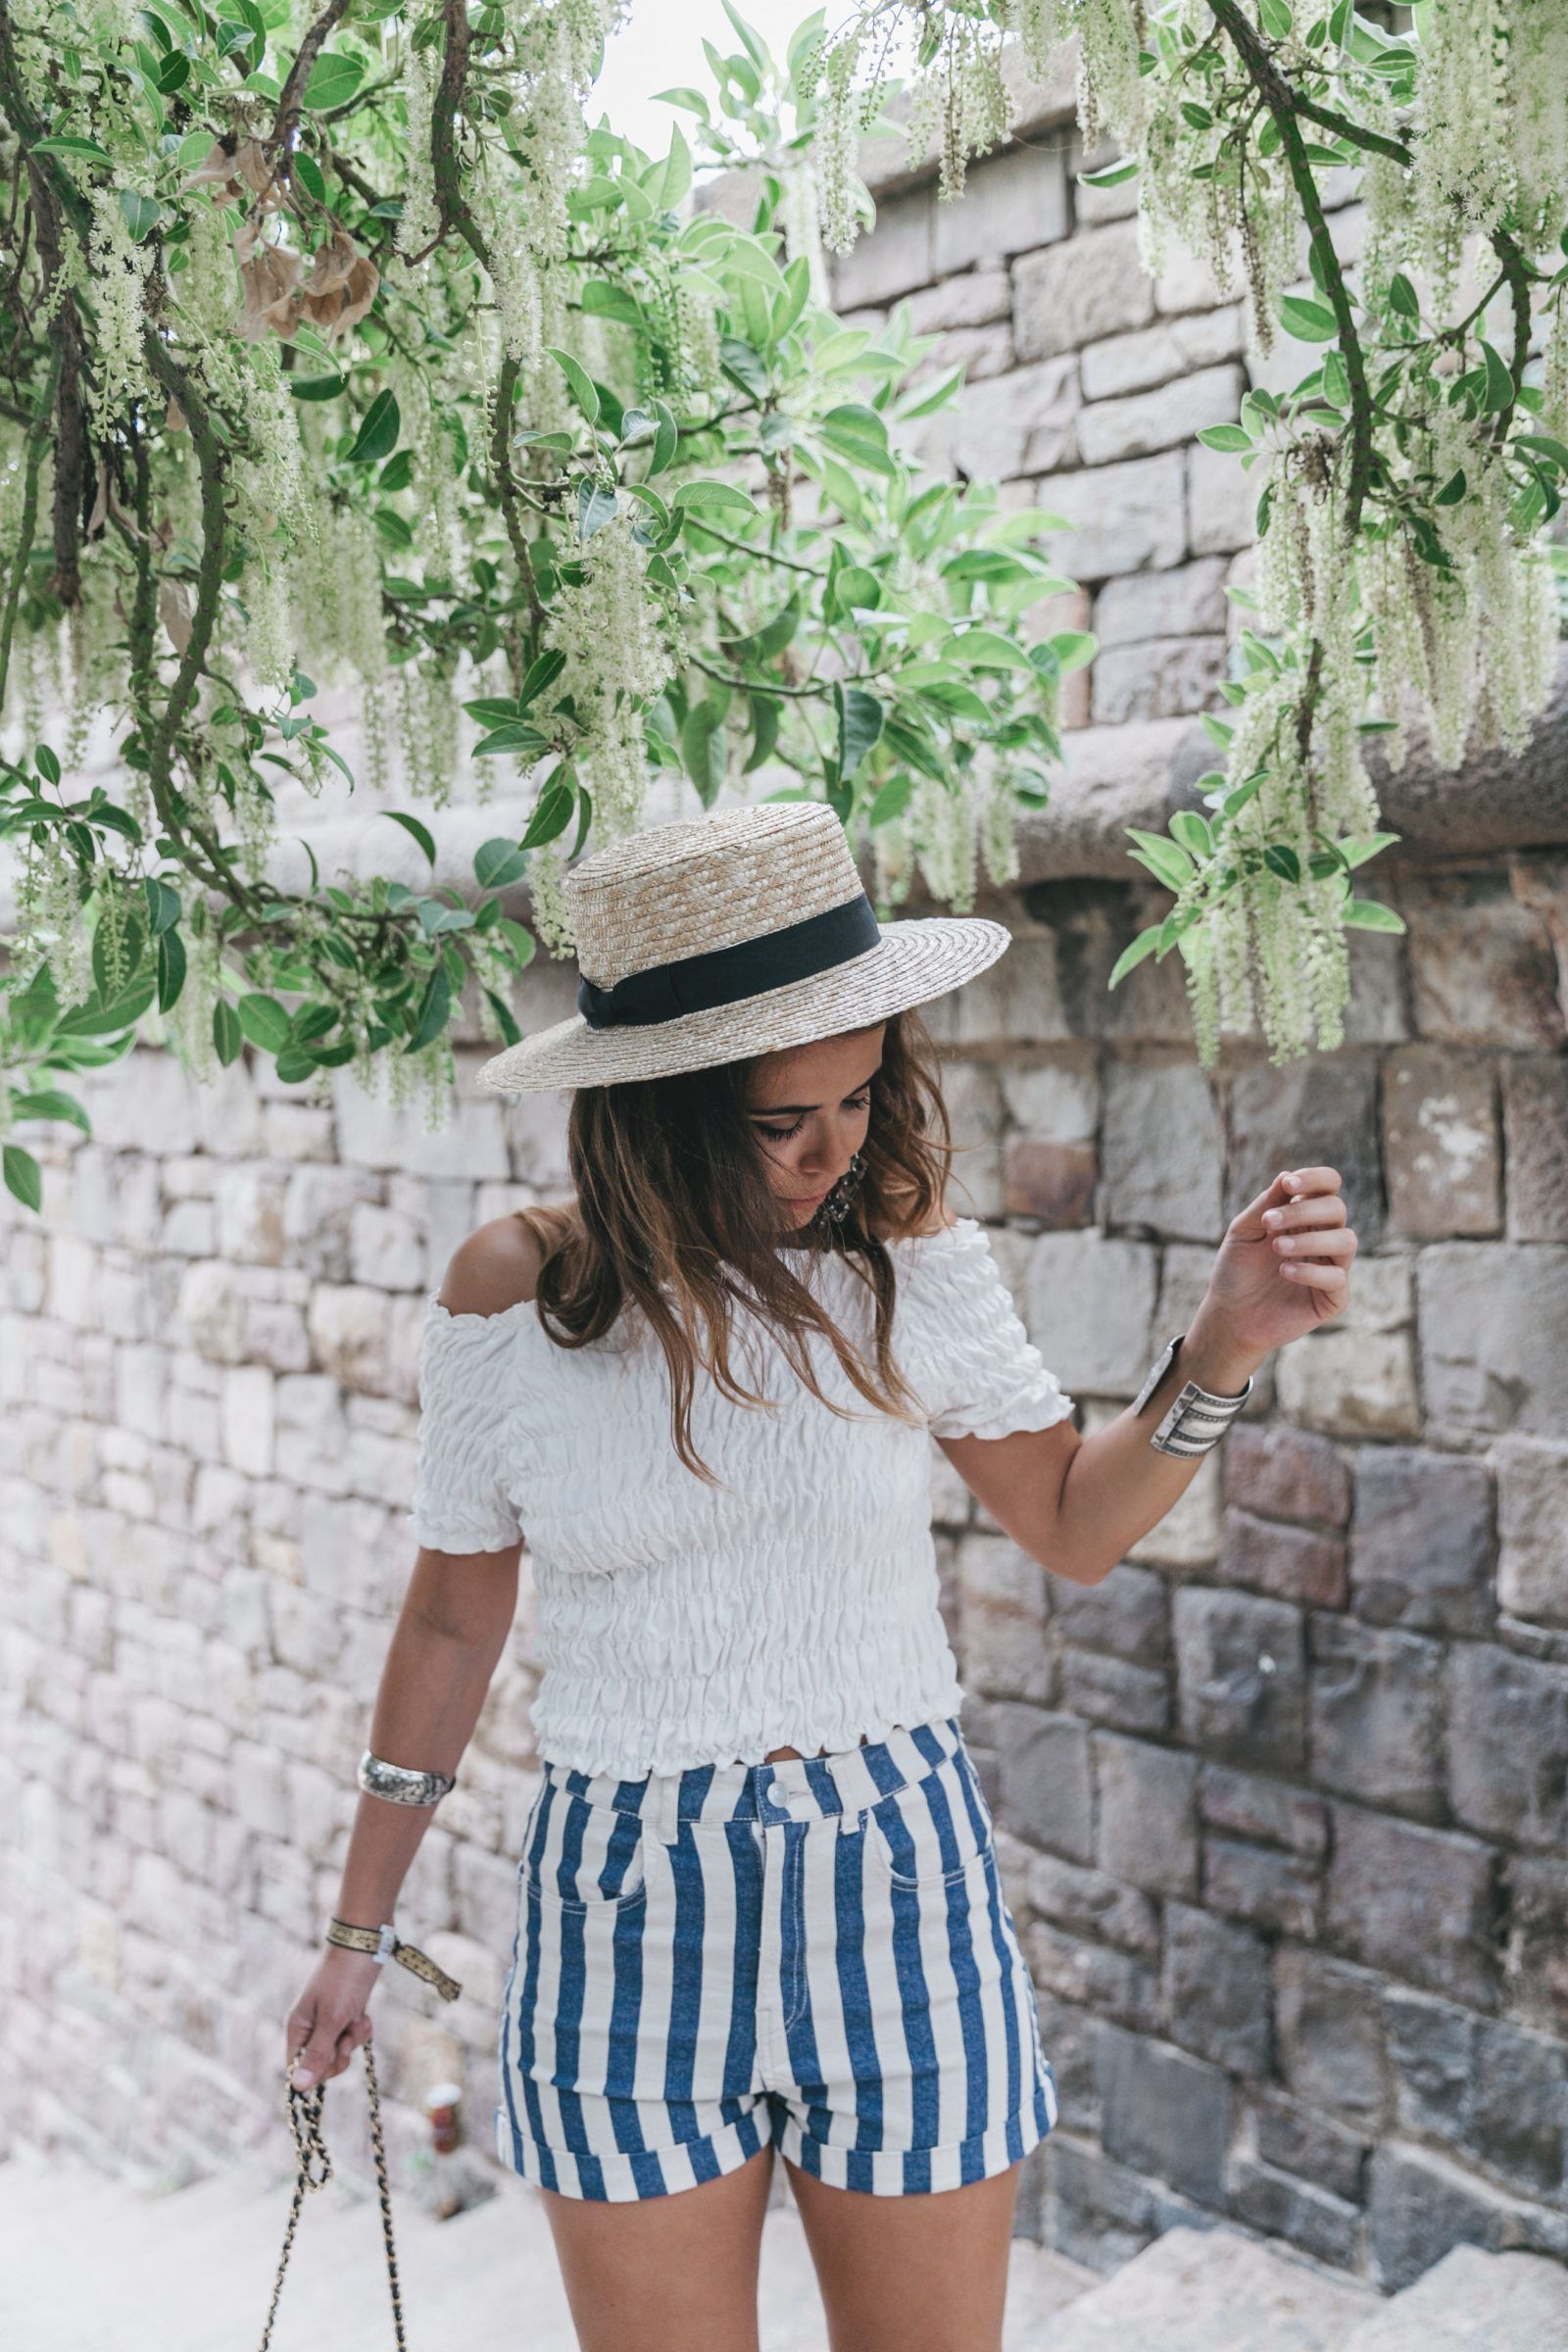 e34f2f6481ed Primavera Sound-HM-Stripped Shorts-Canotier-Hat-Espadrilles-Outfit -Summer-Collage Vintage-11